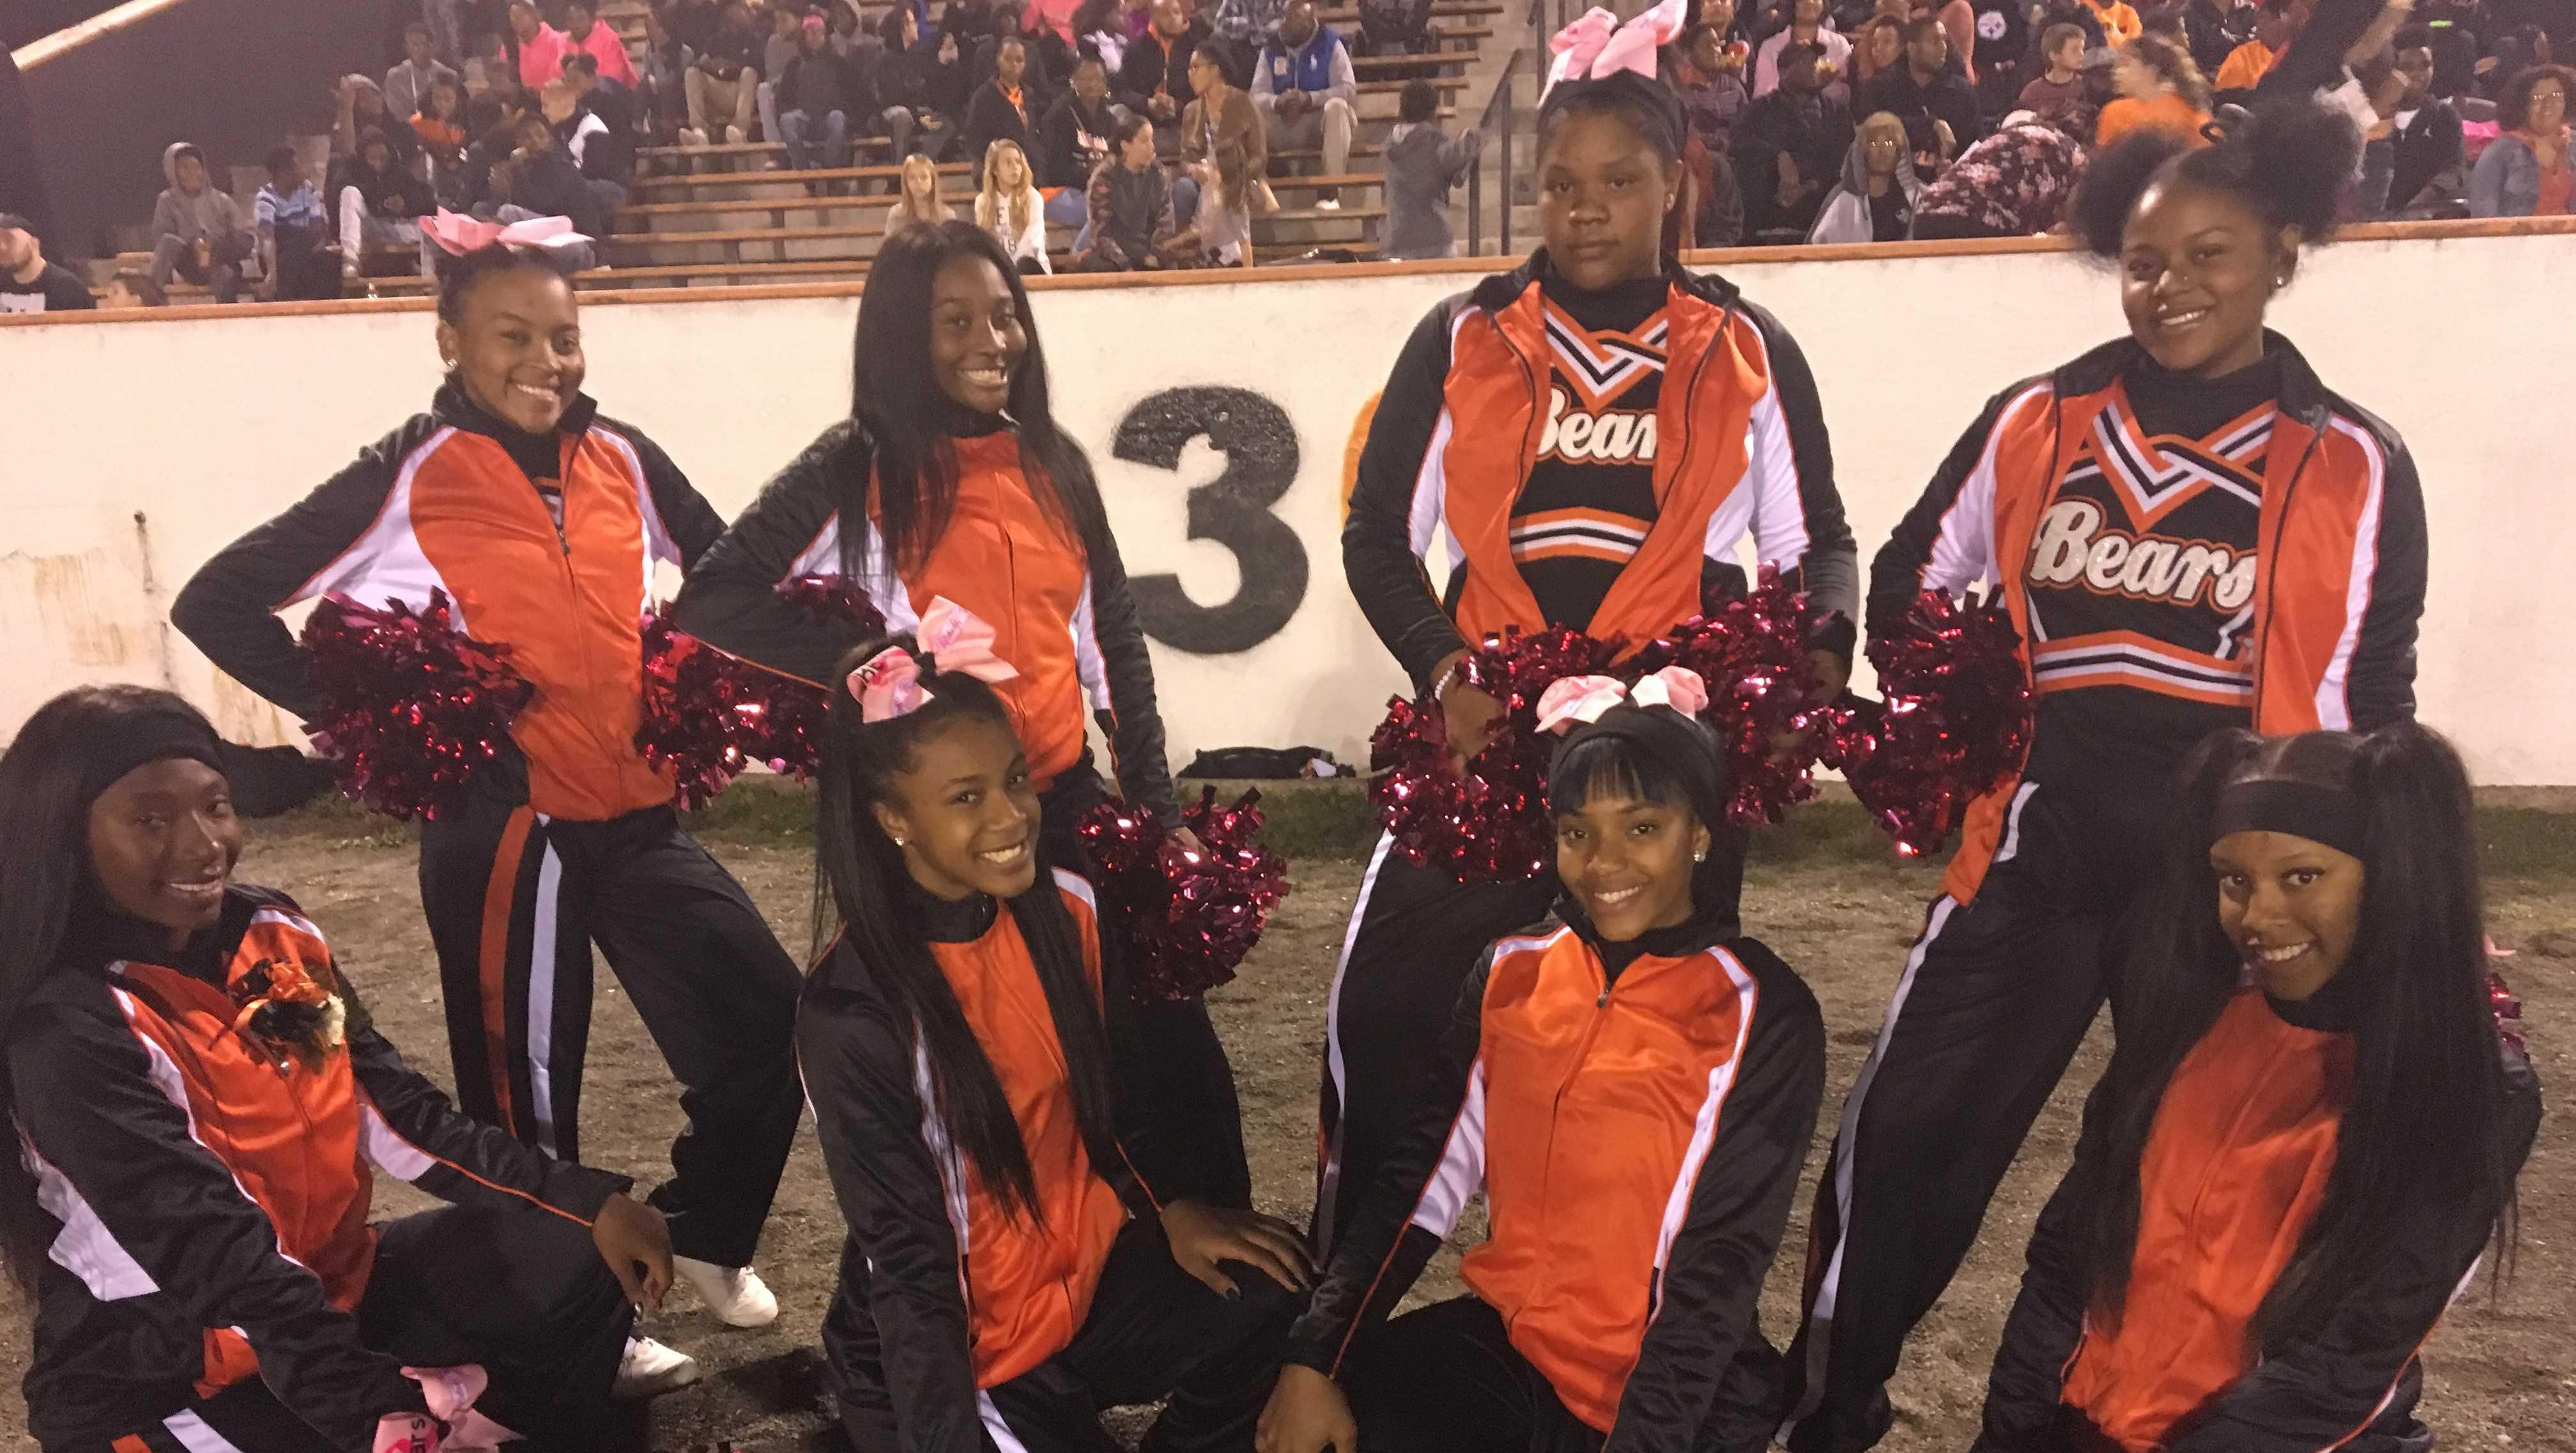 Clairton cheerleaders